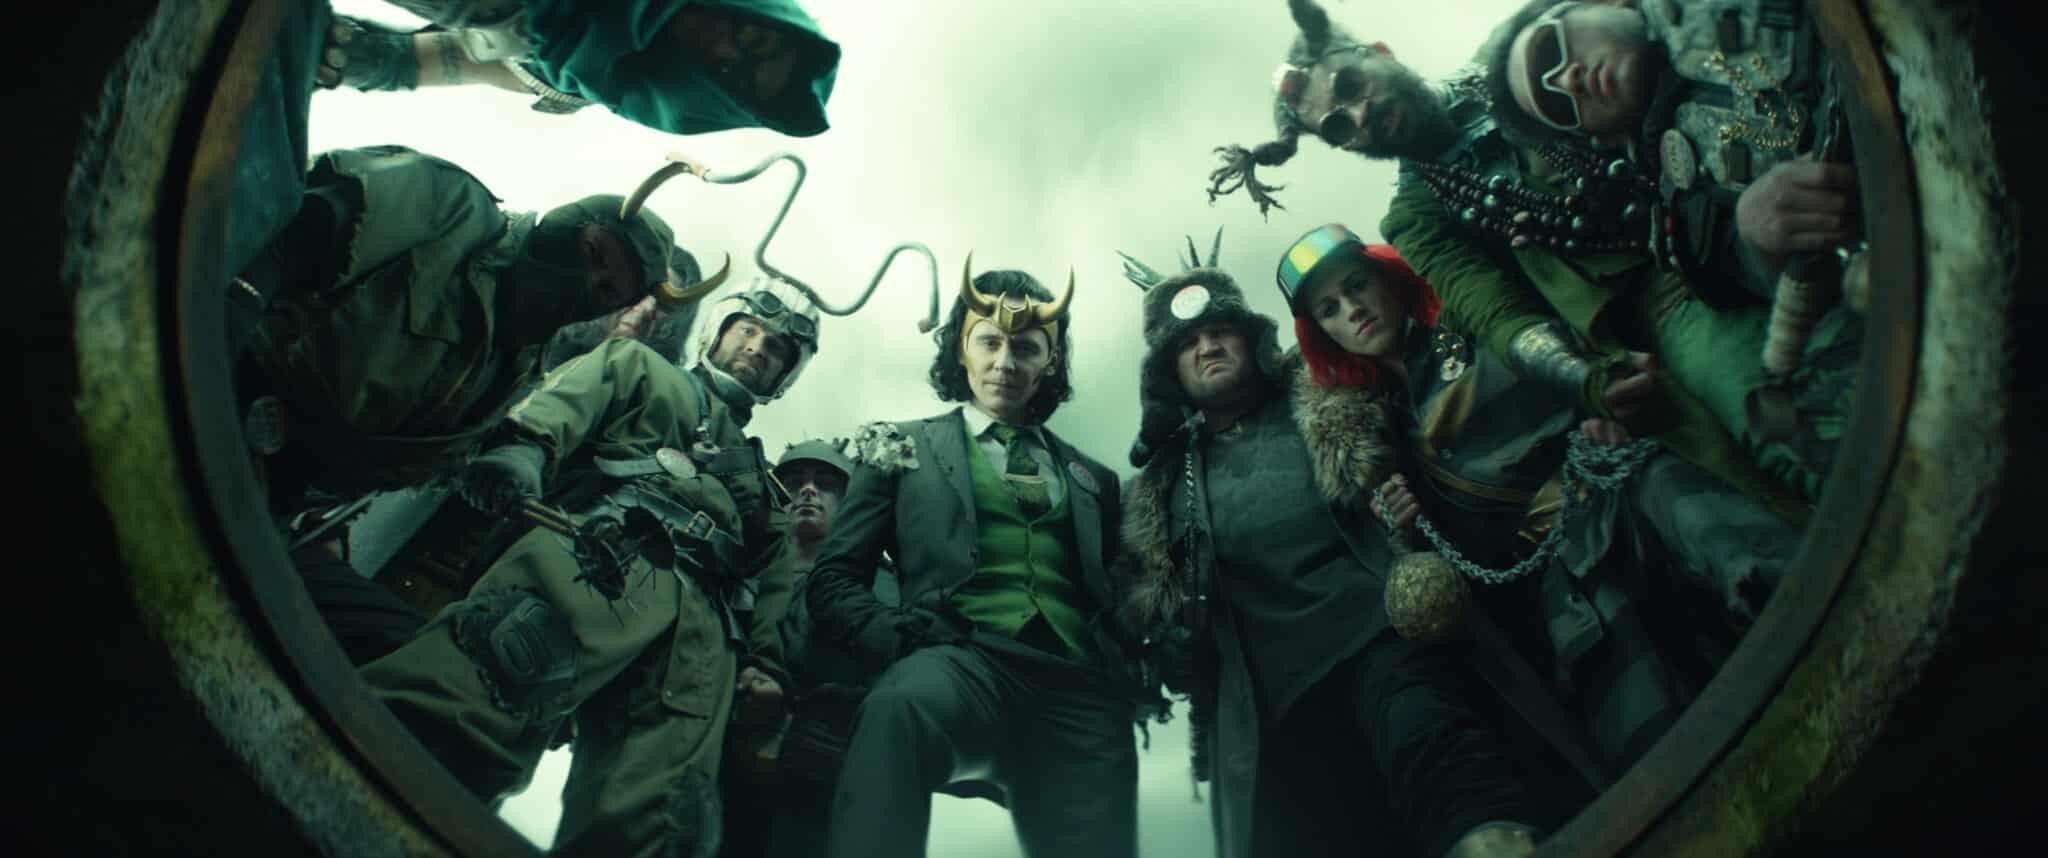 Loki Episode 5: Journey into Mystery